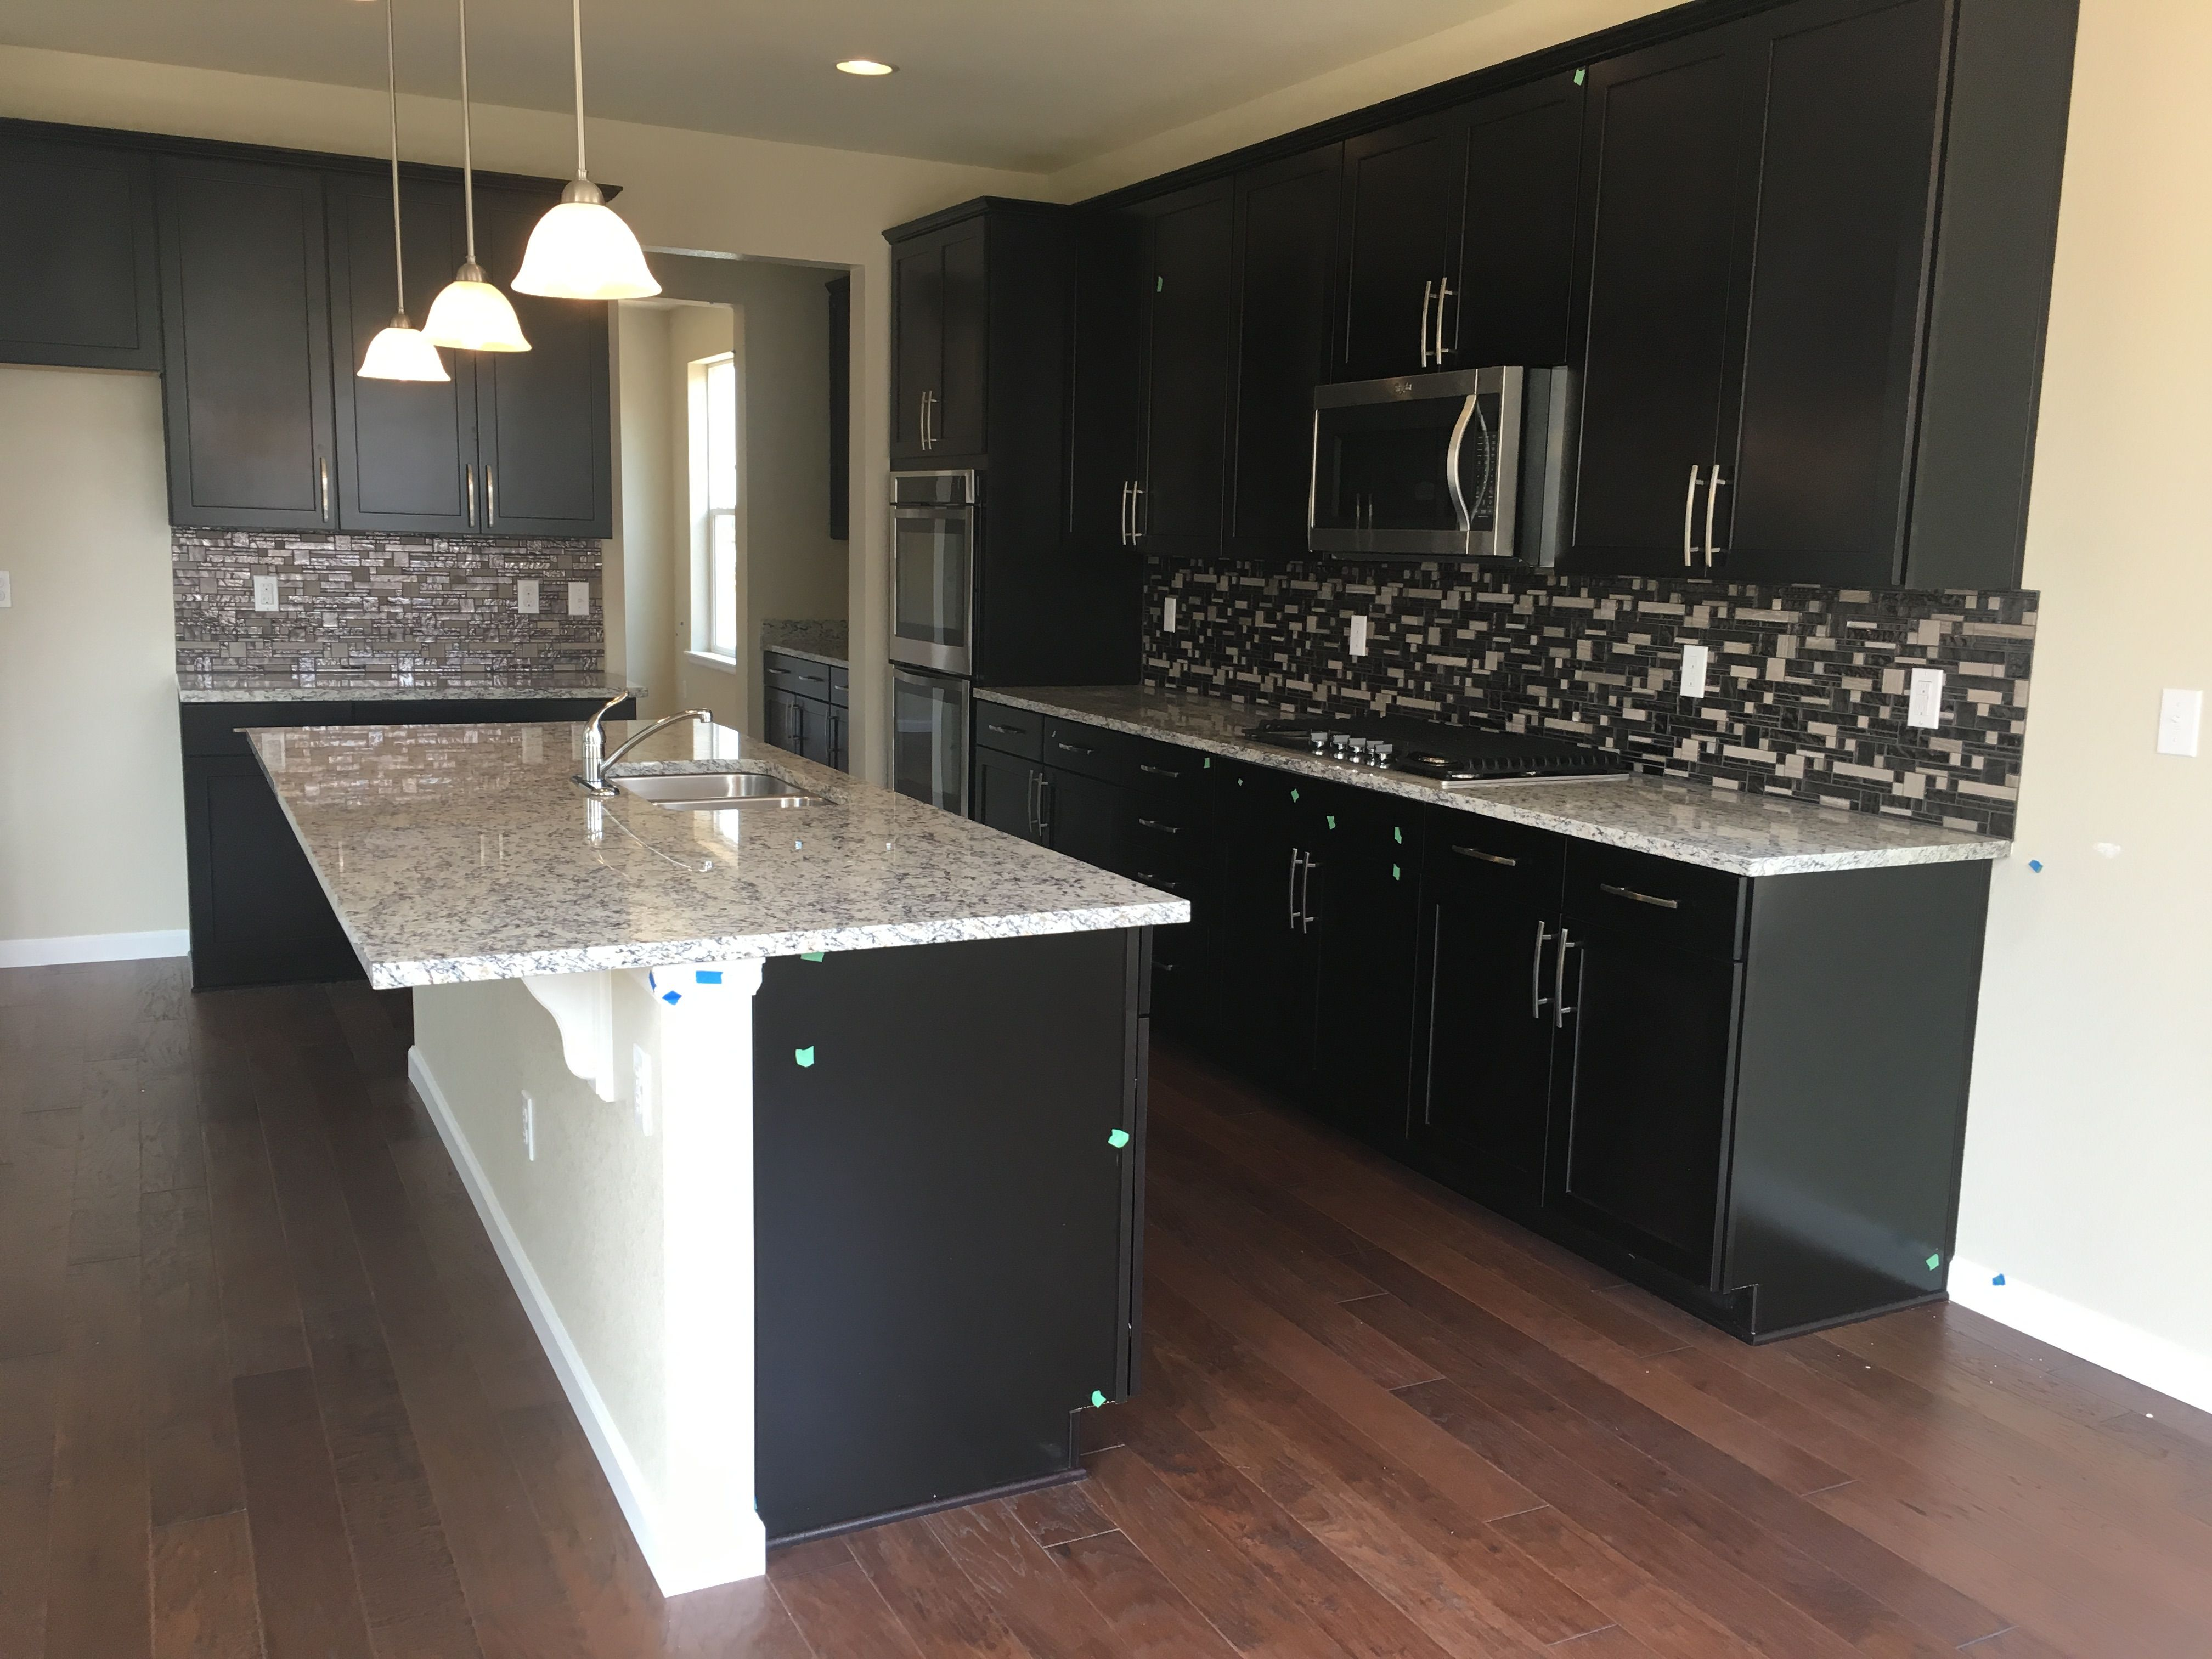 Timberlake Sonoma Espresso Cabinets, Ashen White Granite Countertops U0026  Emser Vista Reach Pattern Backsplash